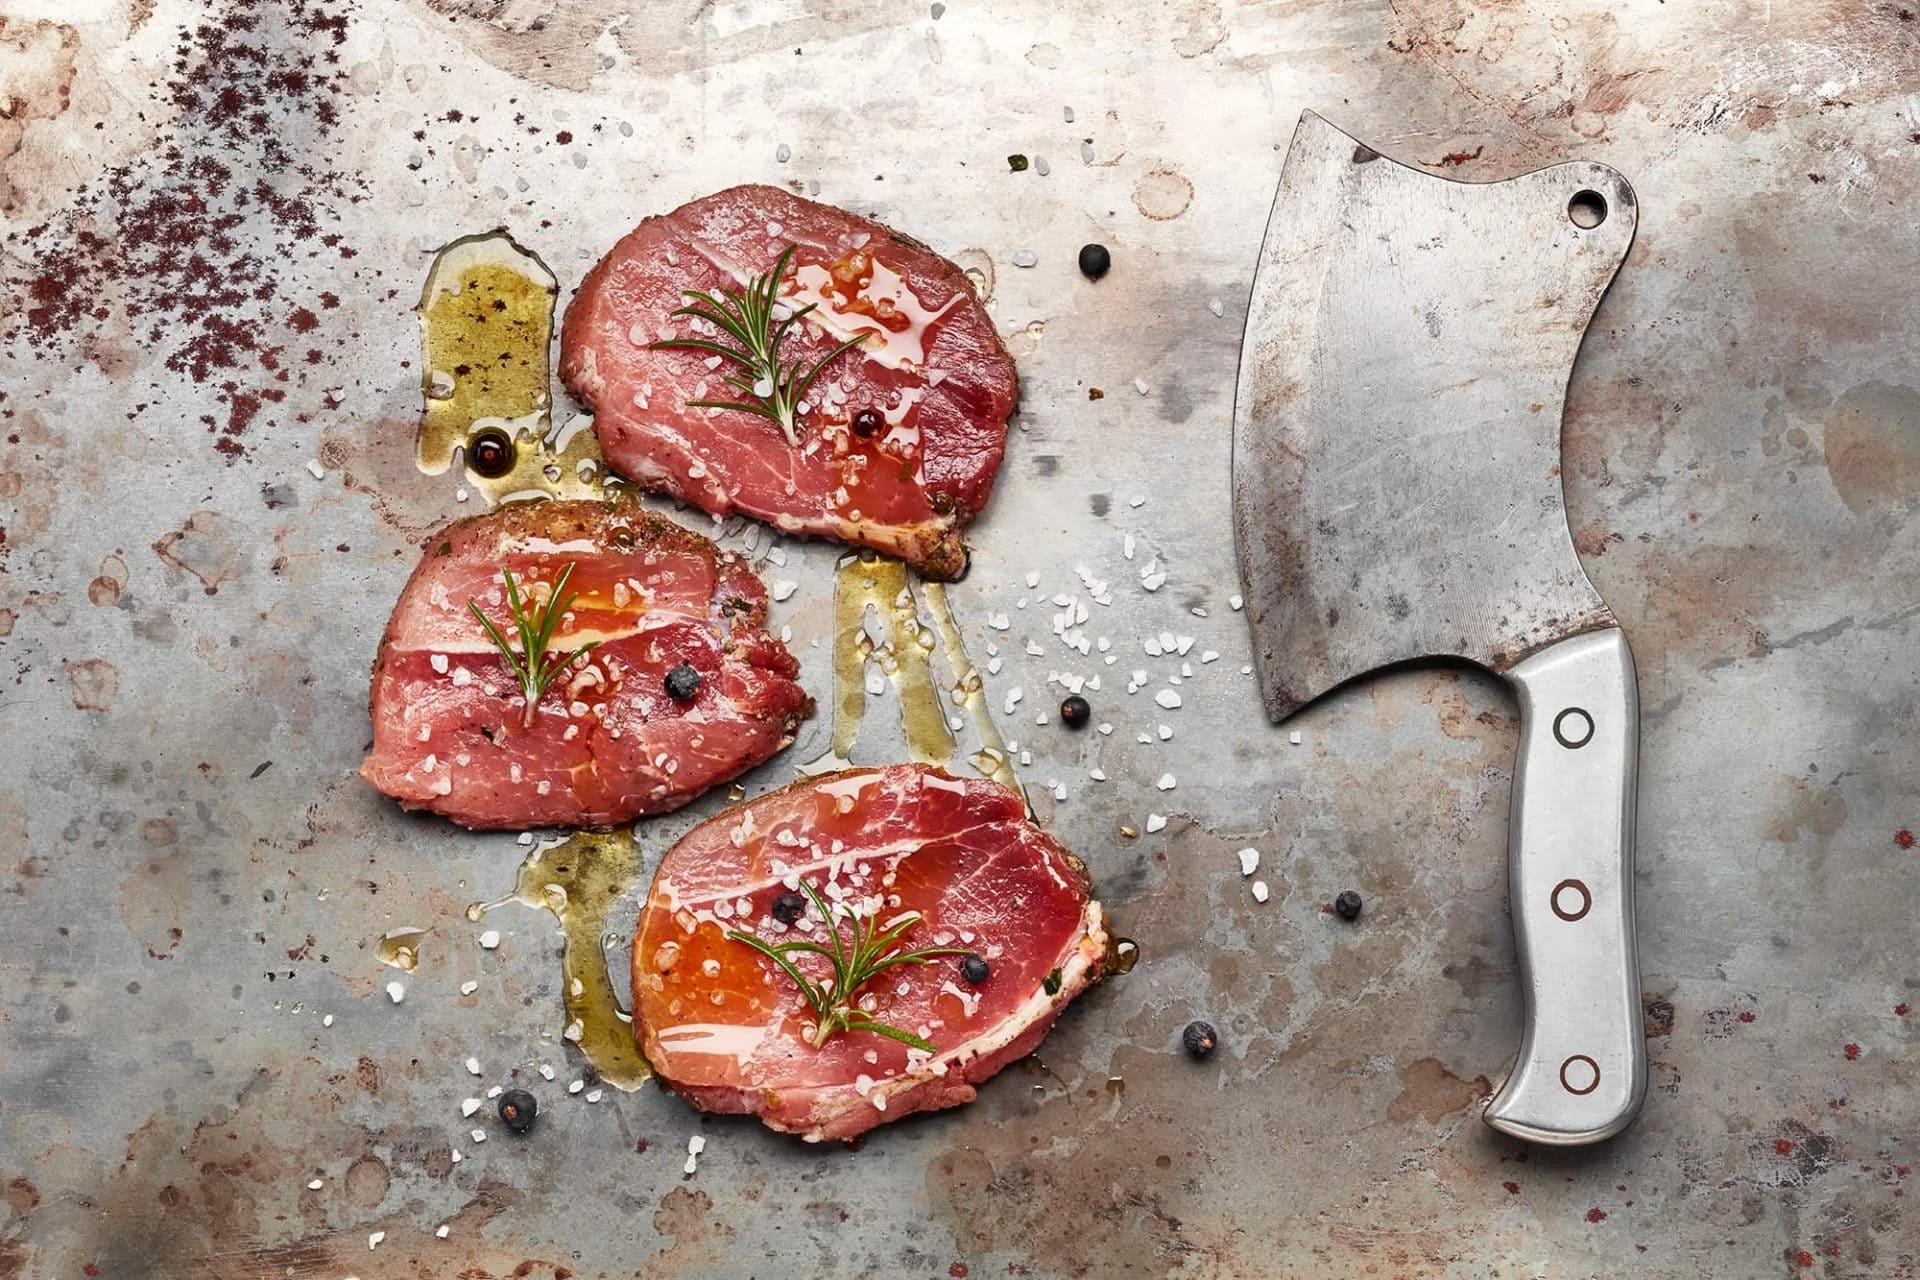 fotografo food ingrosso carne bologna modena trieste milano firenze advertising e fotografia commerciale